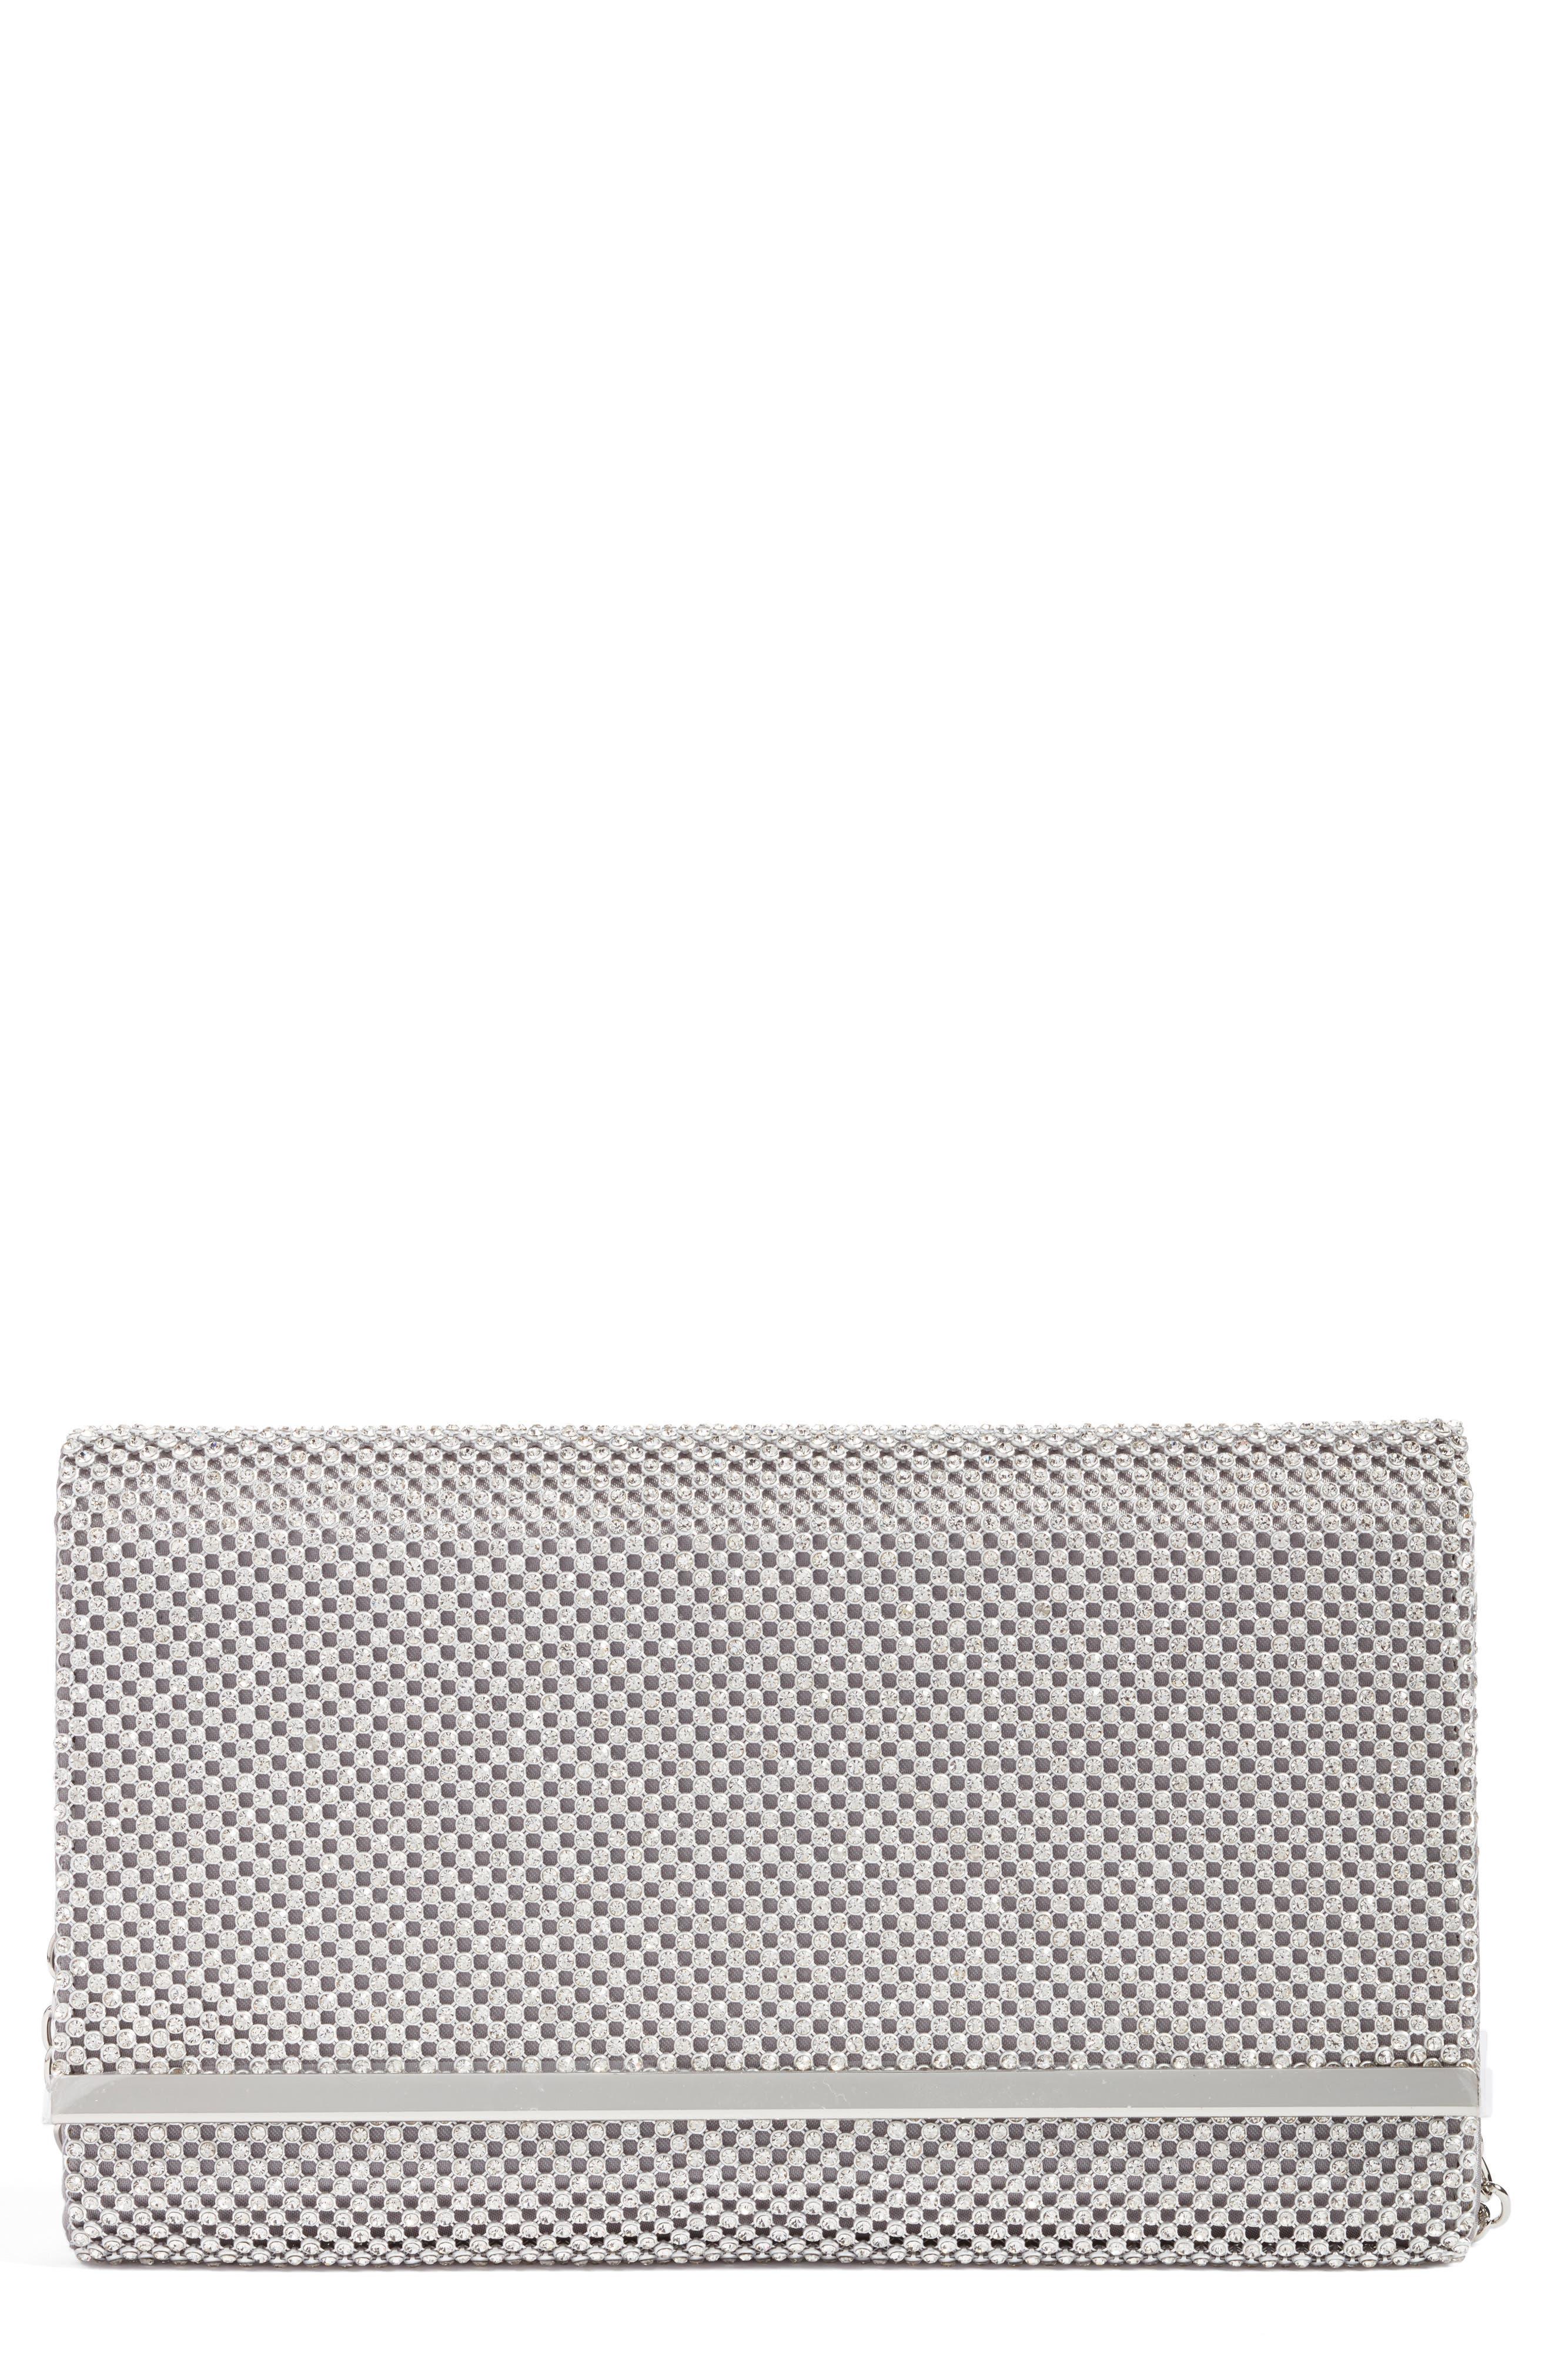 Crystal Mesh Bar Clutch,                         Main,                         color, Silver